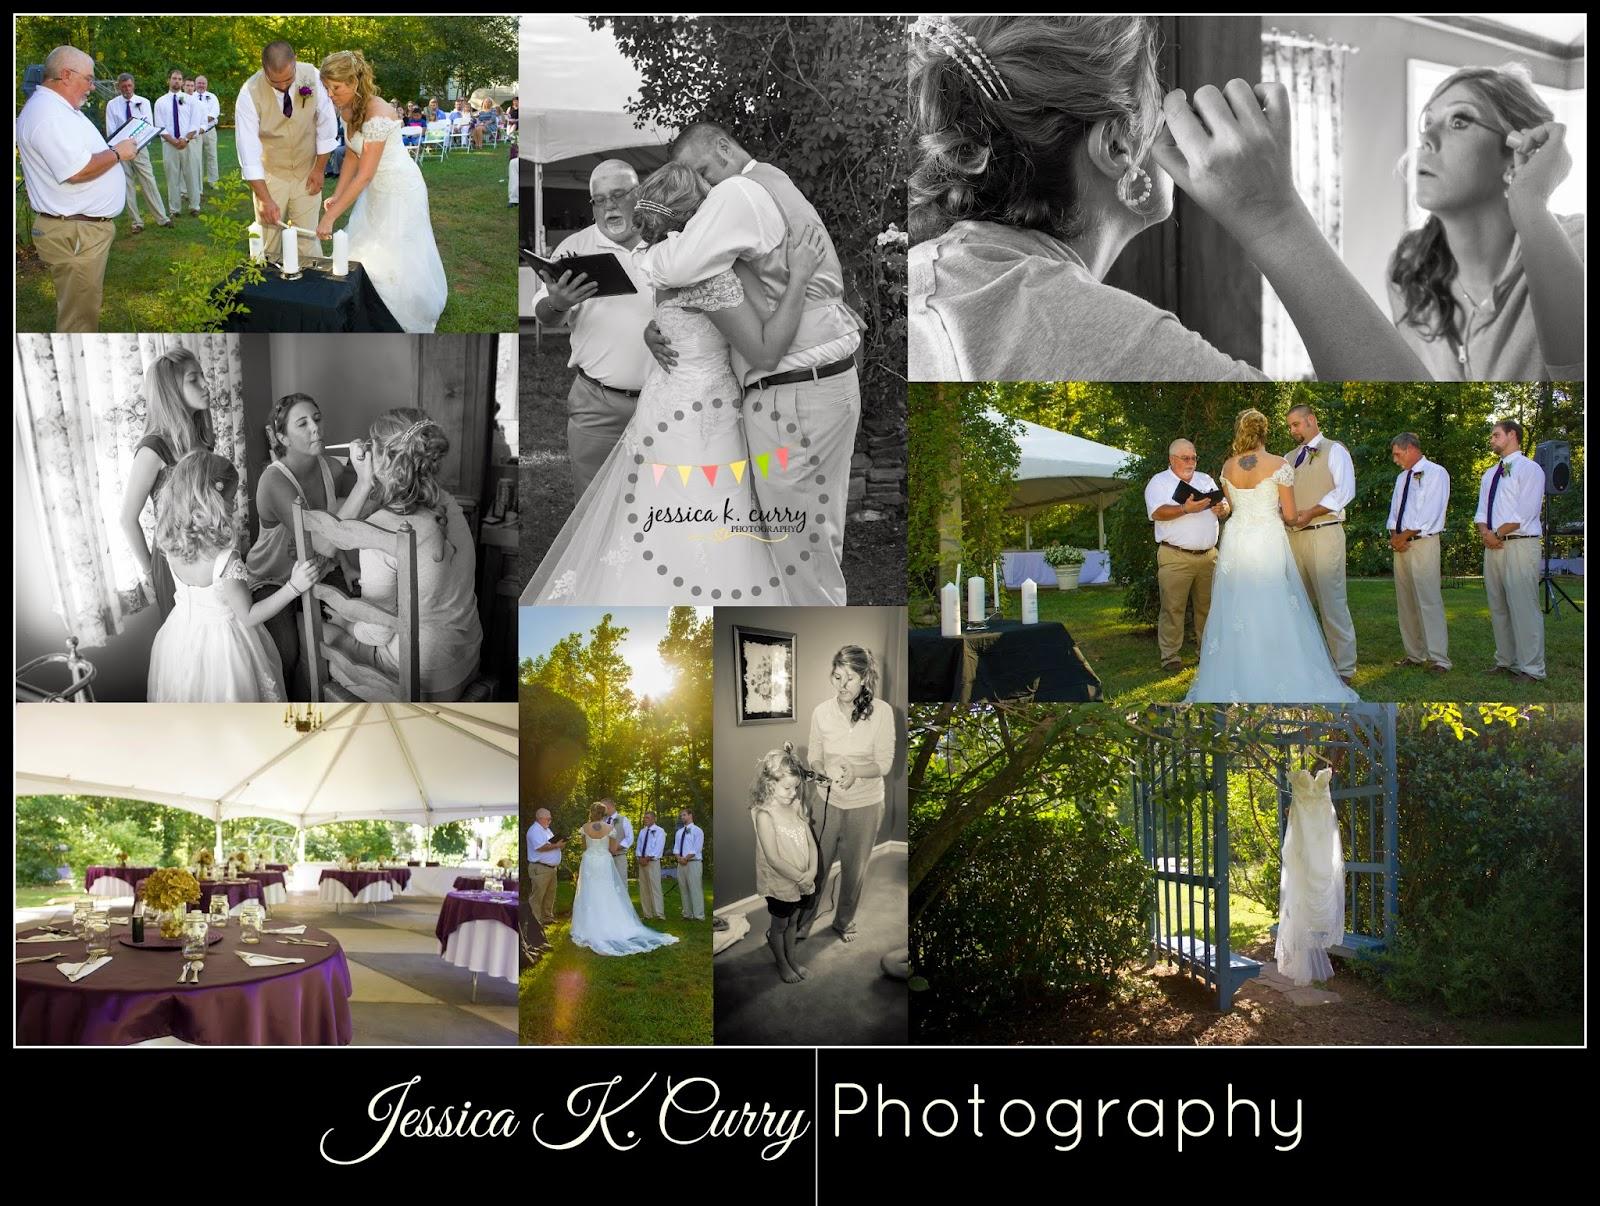 wedding photographers in asheboro, asheboro wedding photographers, asheboro photographers, photographers in asheboro